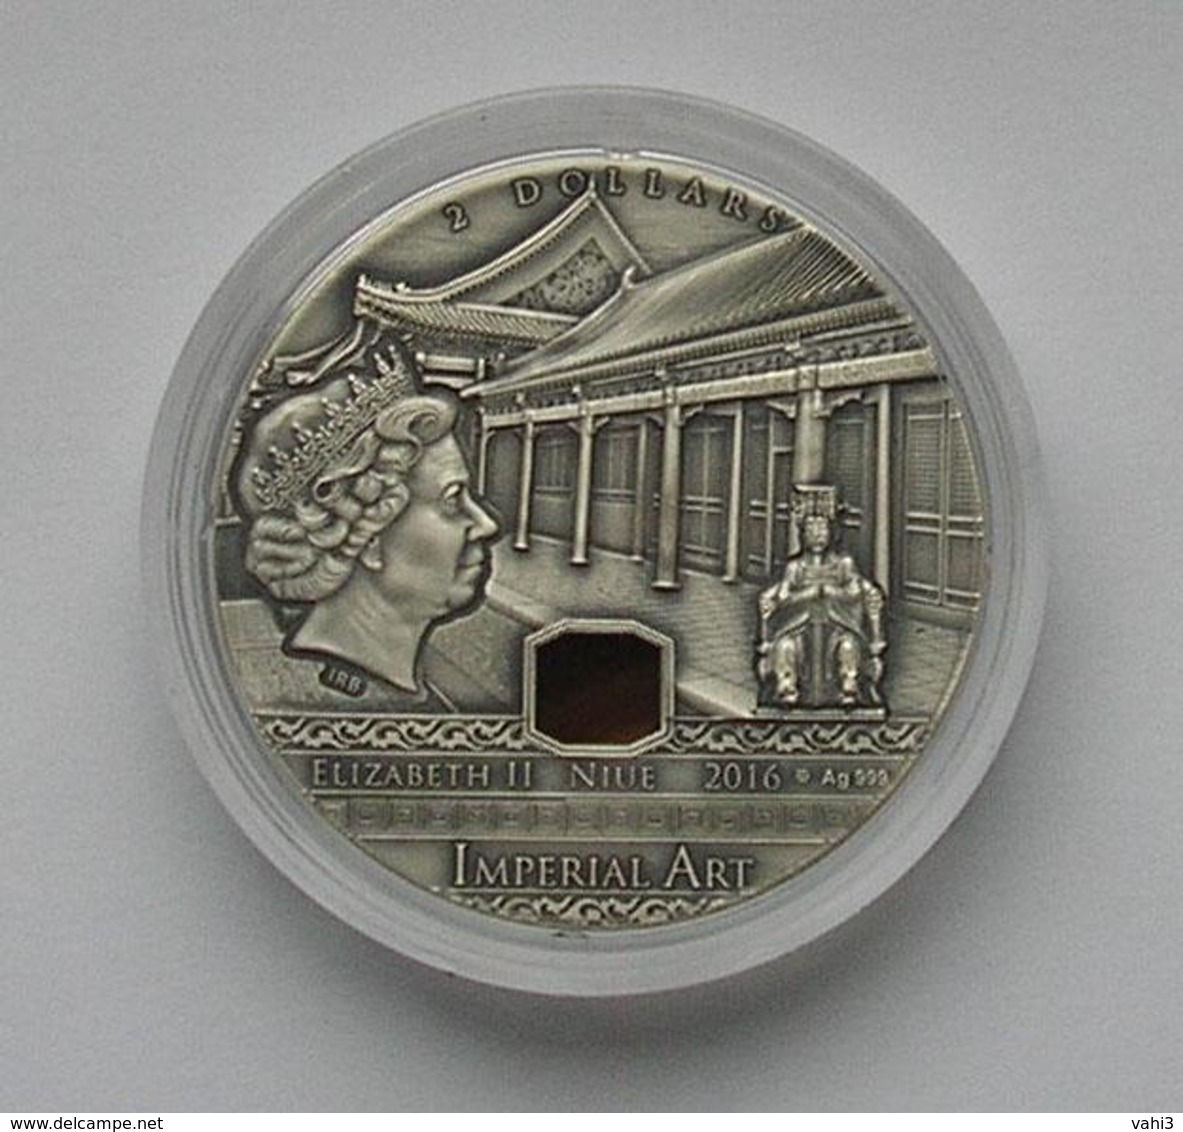 Niue 2 Dollars 2016 China Imperial Art Crystal 2 Oz  Silver Coin - Monnaies